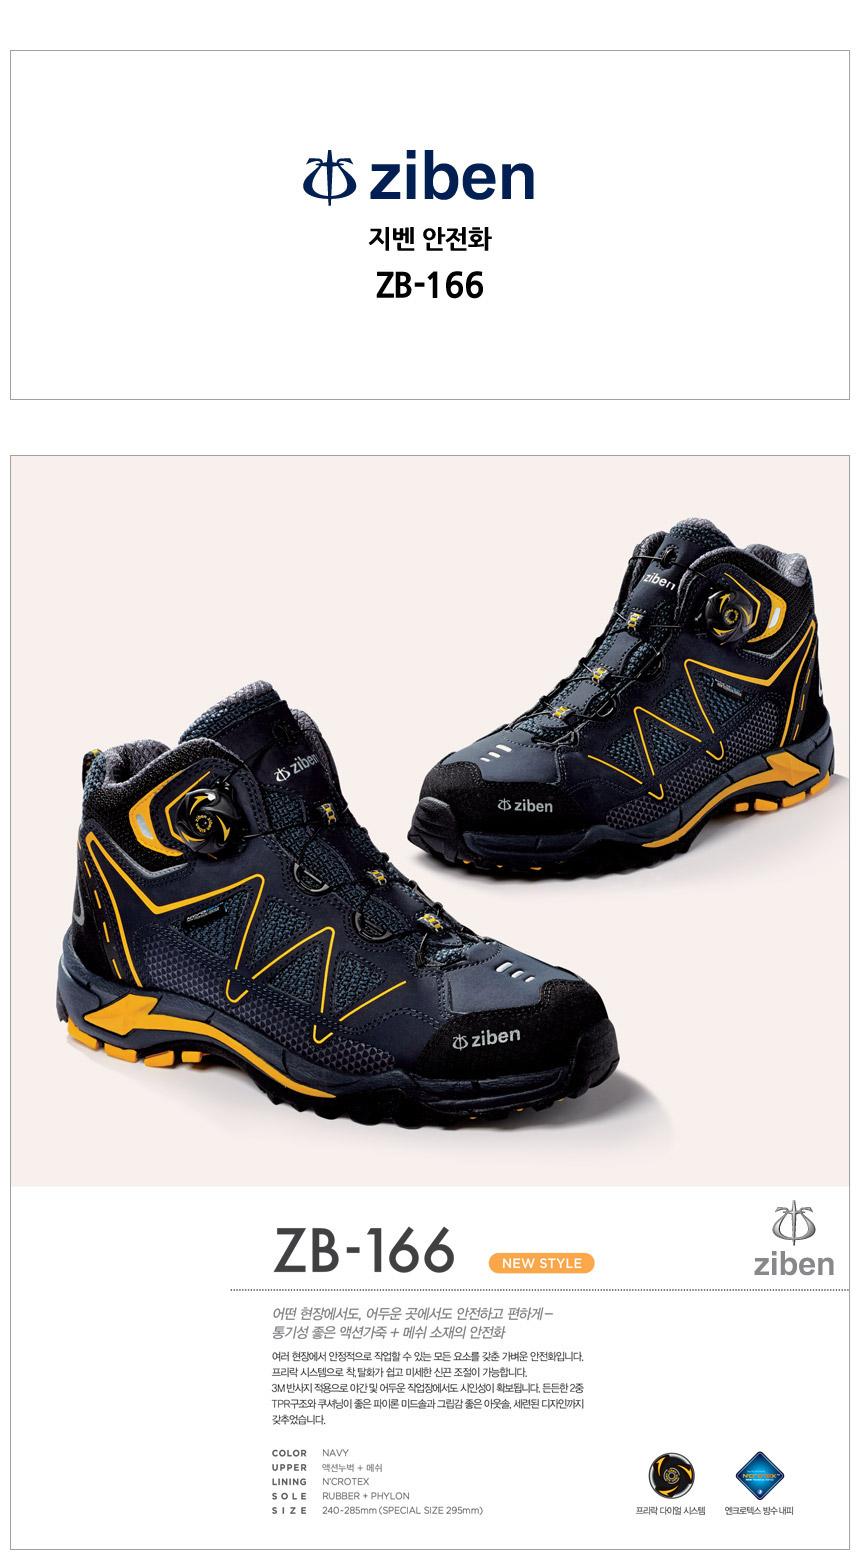 Giày bảo hộ Ziben 166